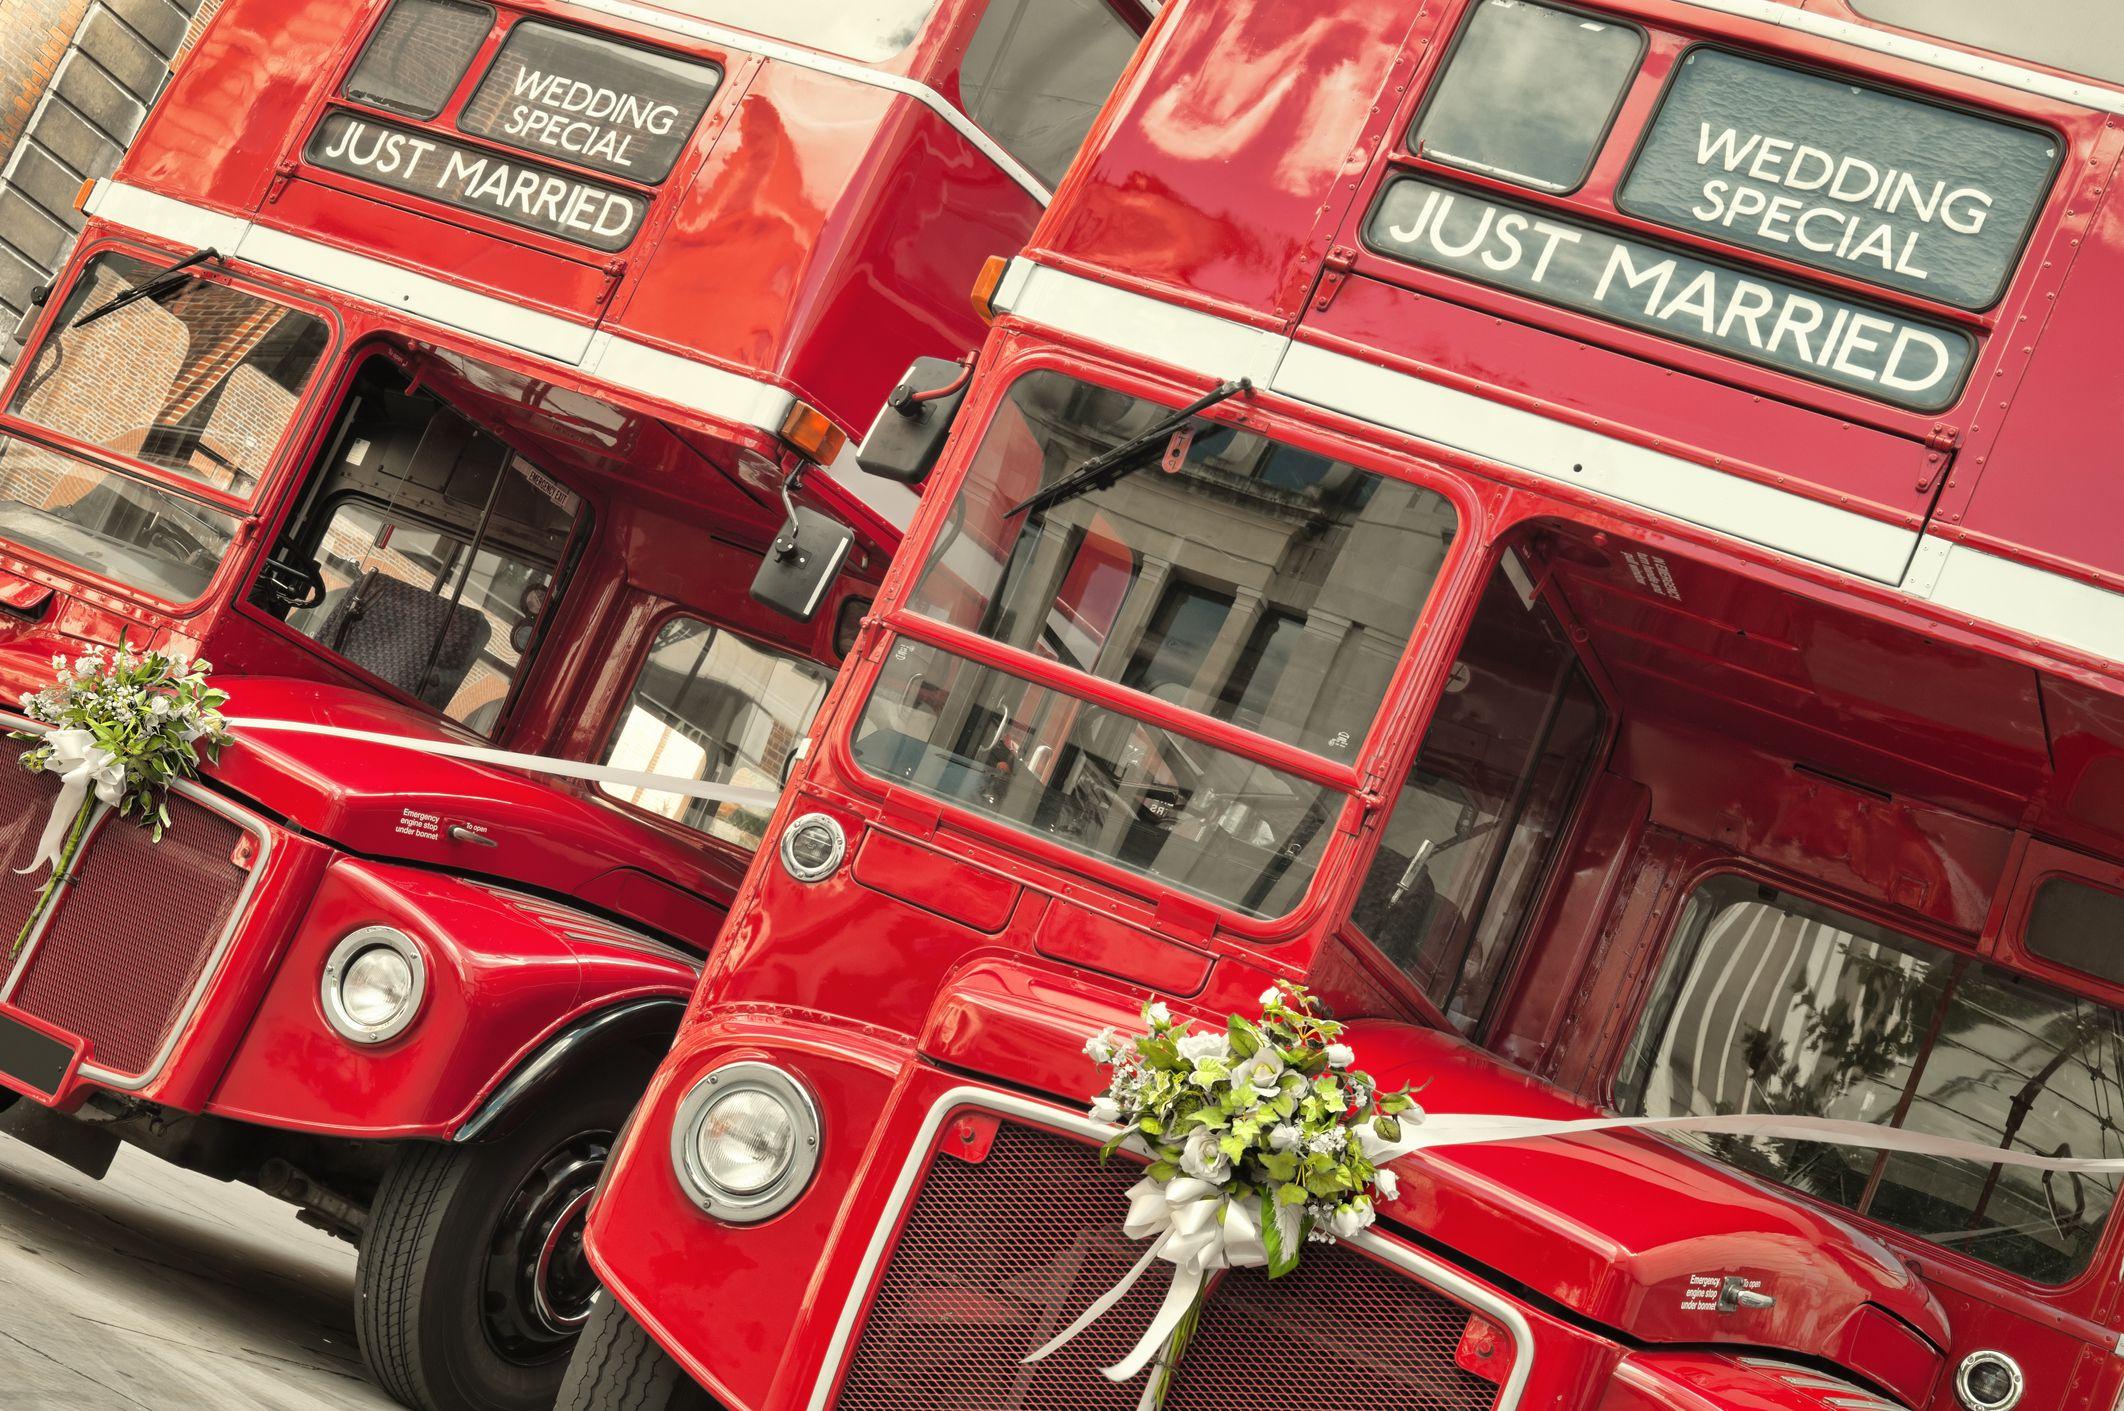 Arrangement of transport for wedding guests